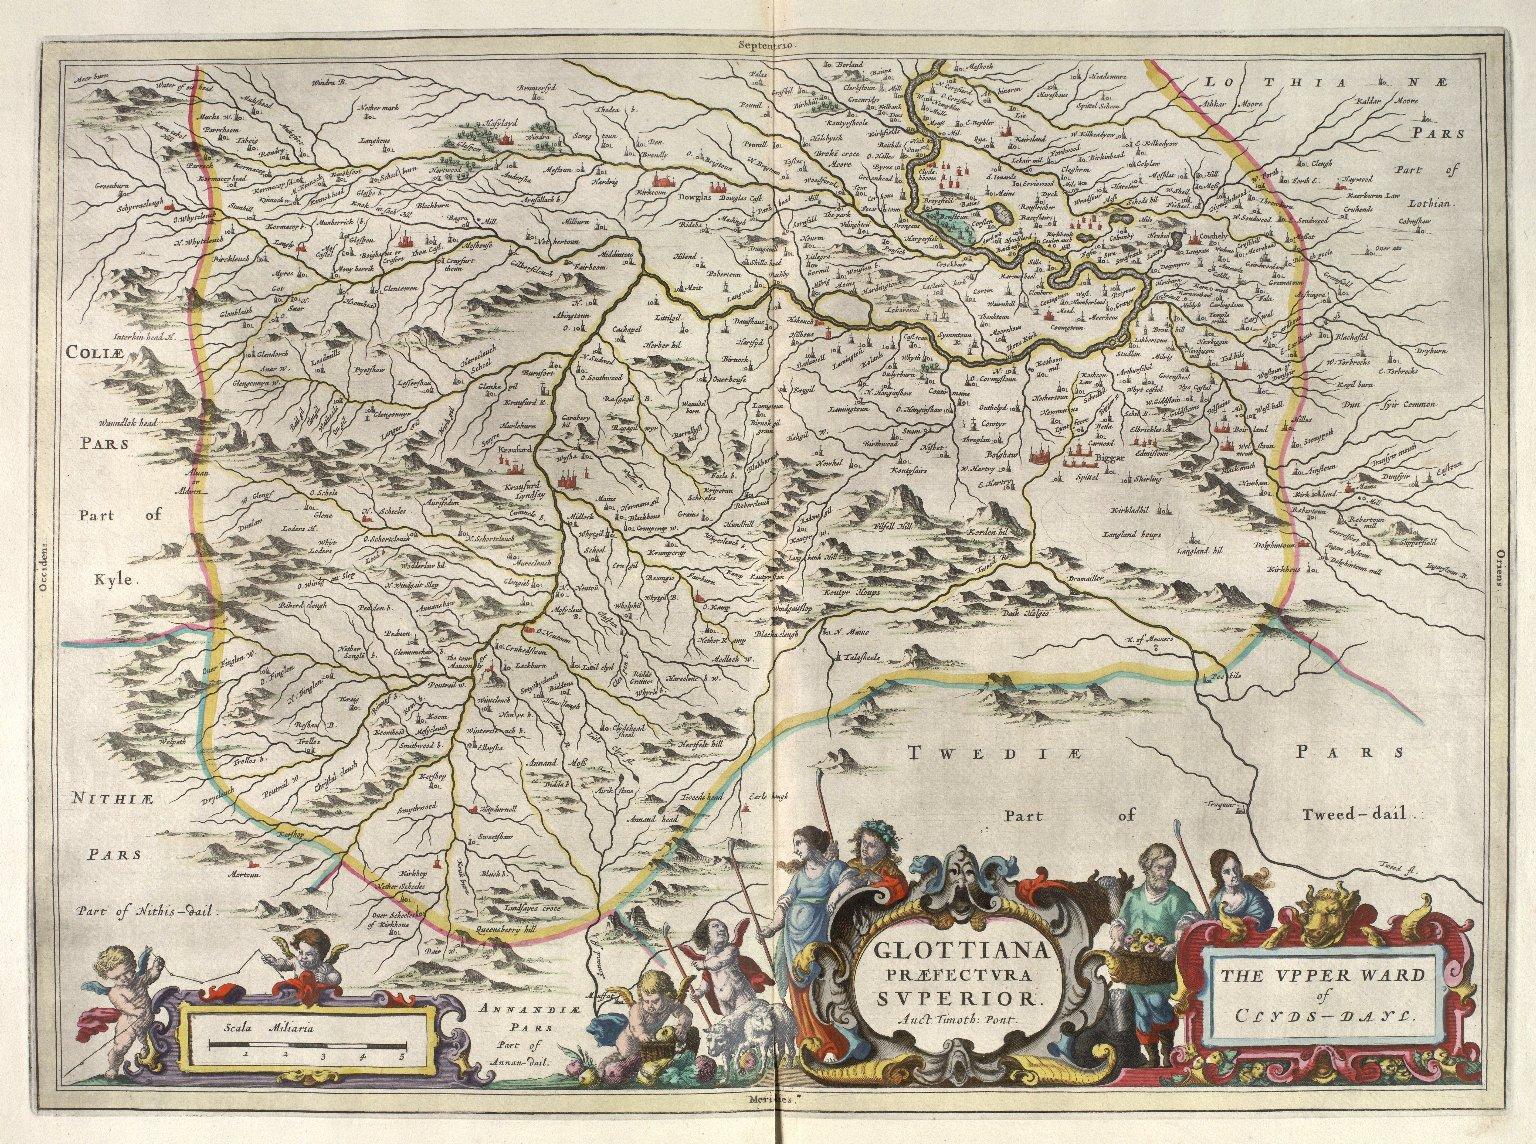 [Geographiae Blavianae] [Also known as: Atlas major] [076 of 153]